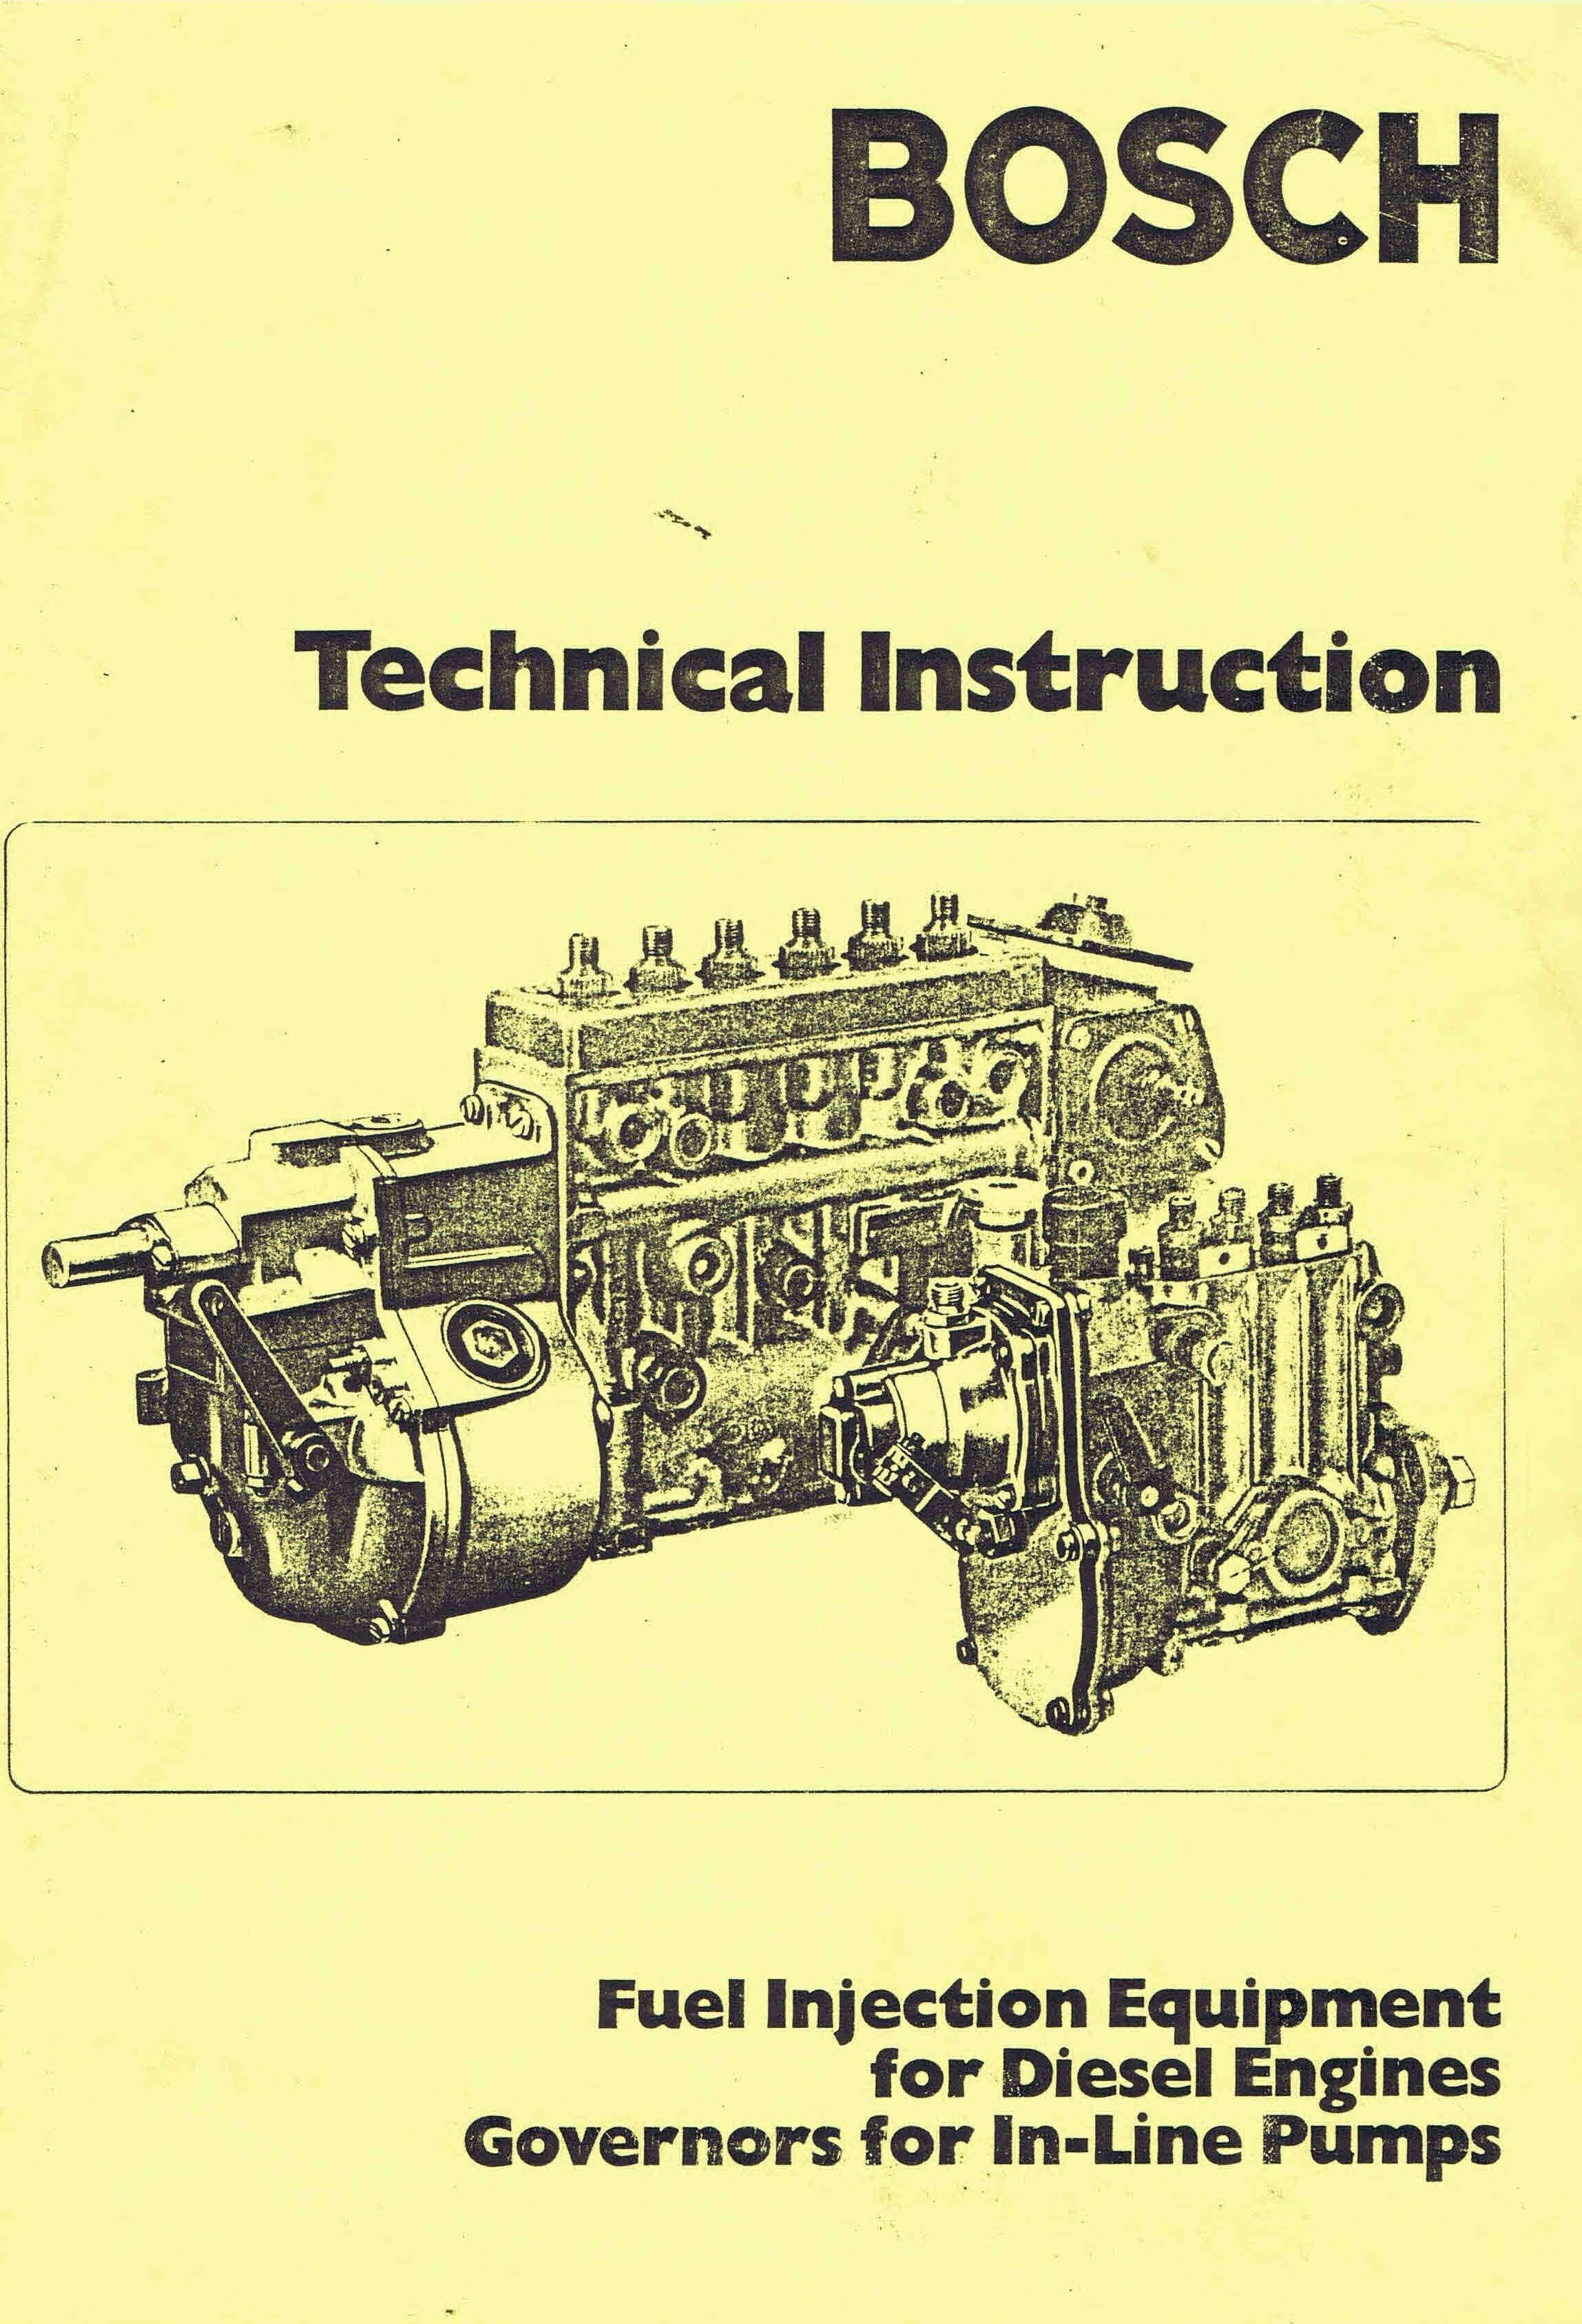 Bosch p7100 pump service manual